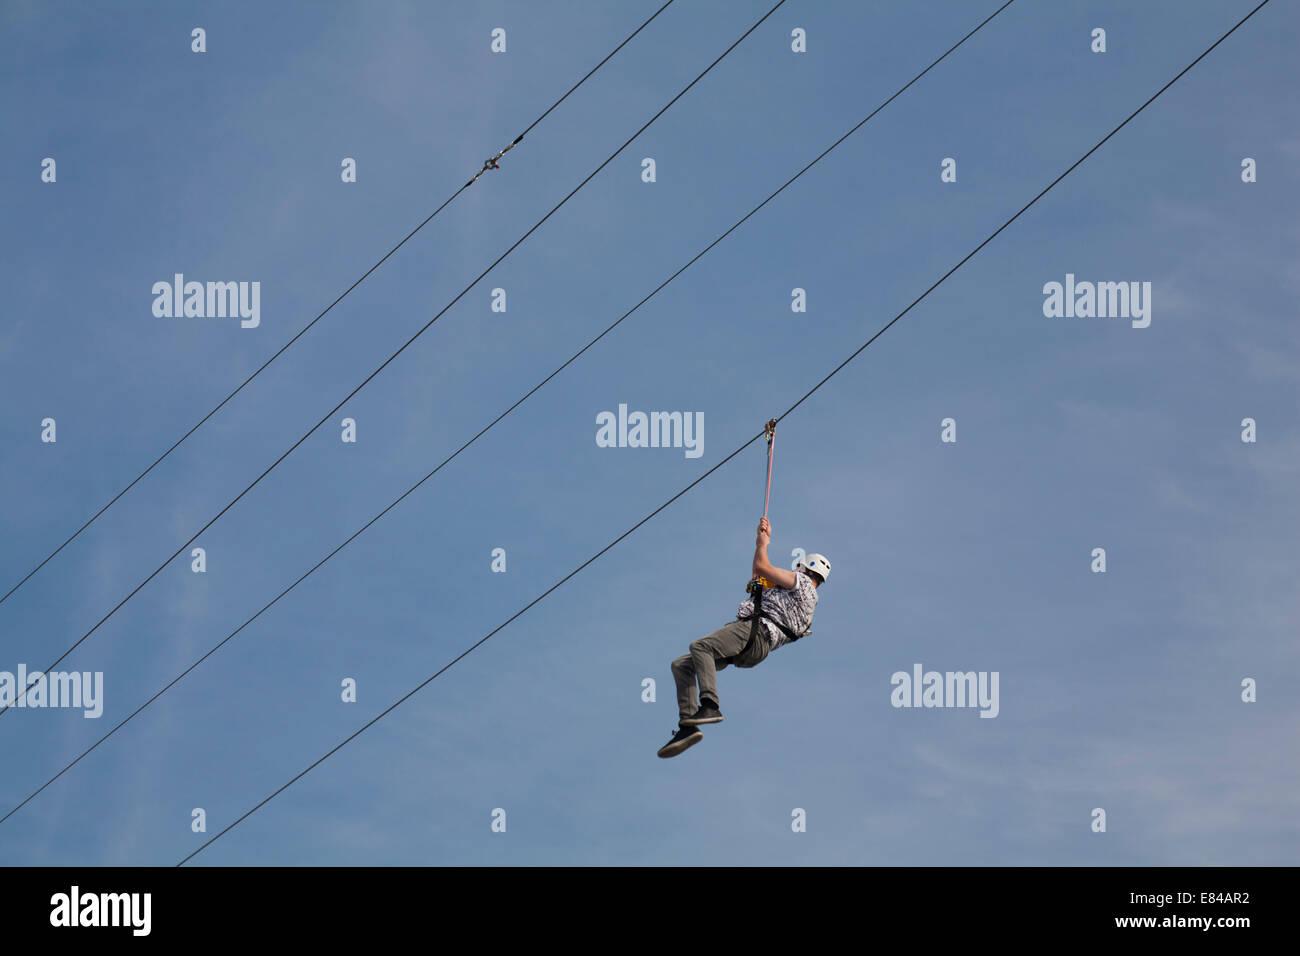 Zipline Tower Stock Photos & Zipline Tower Stock Images - Alamy